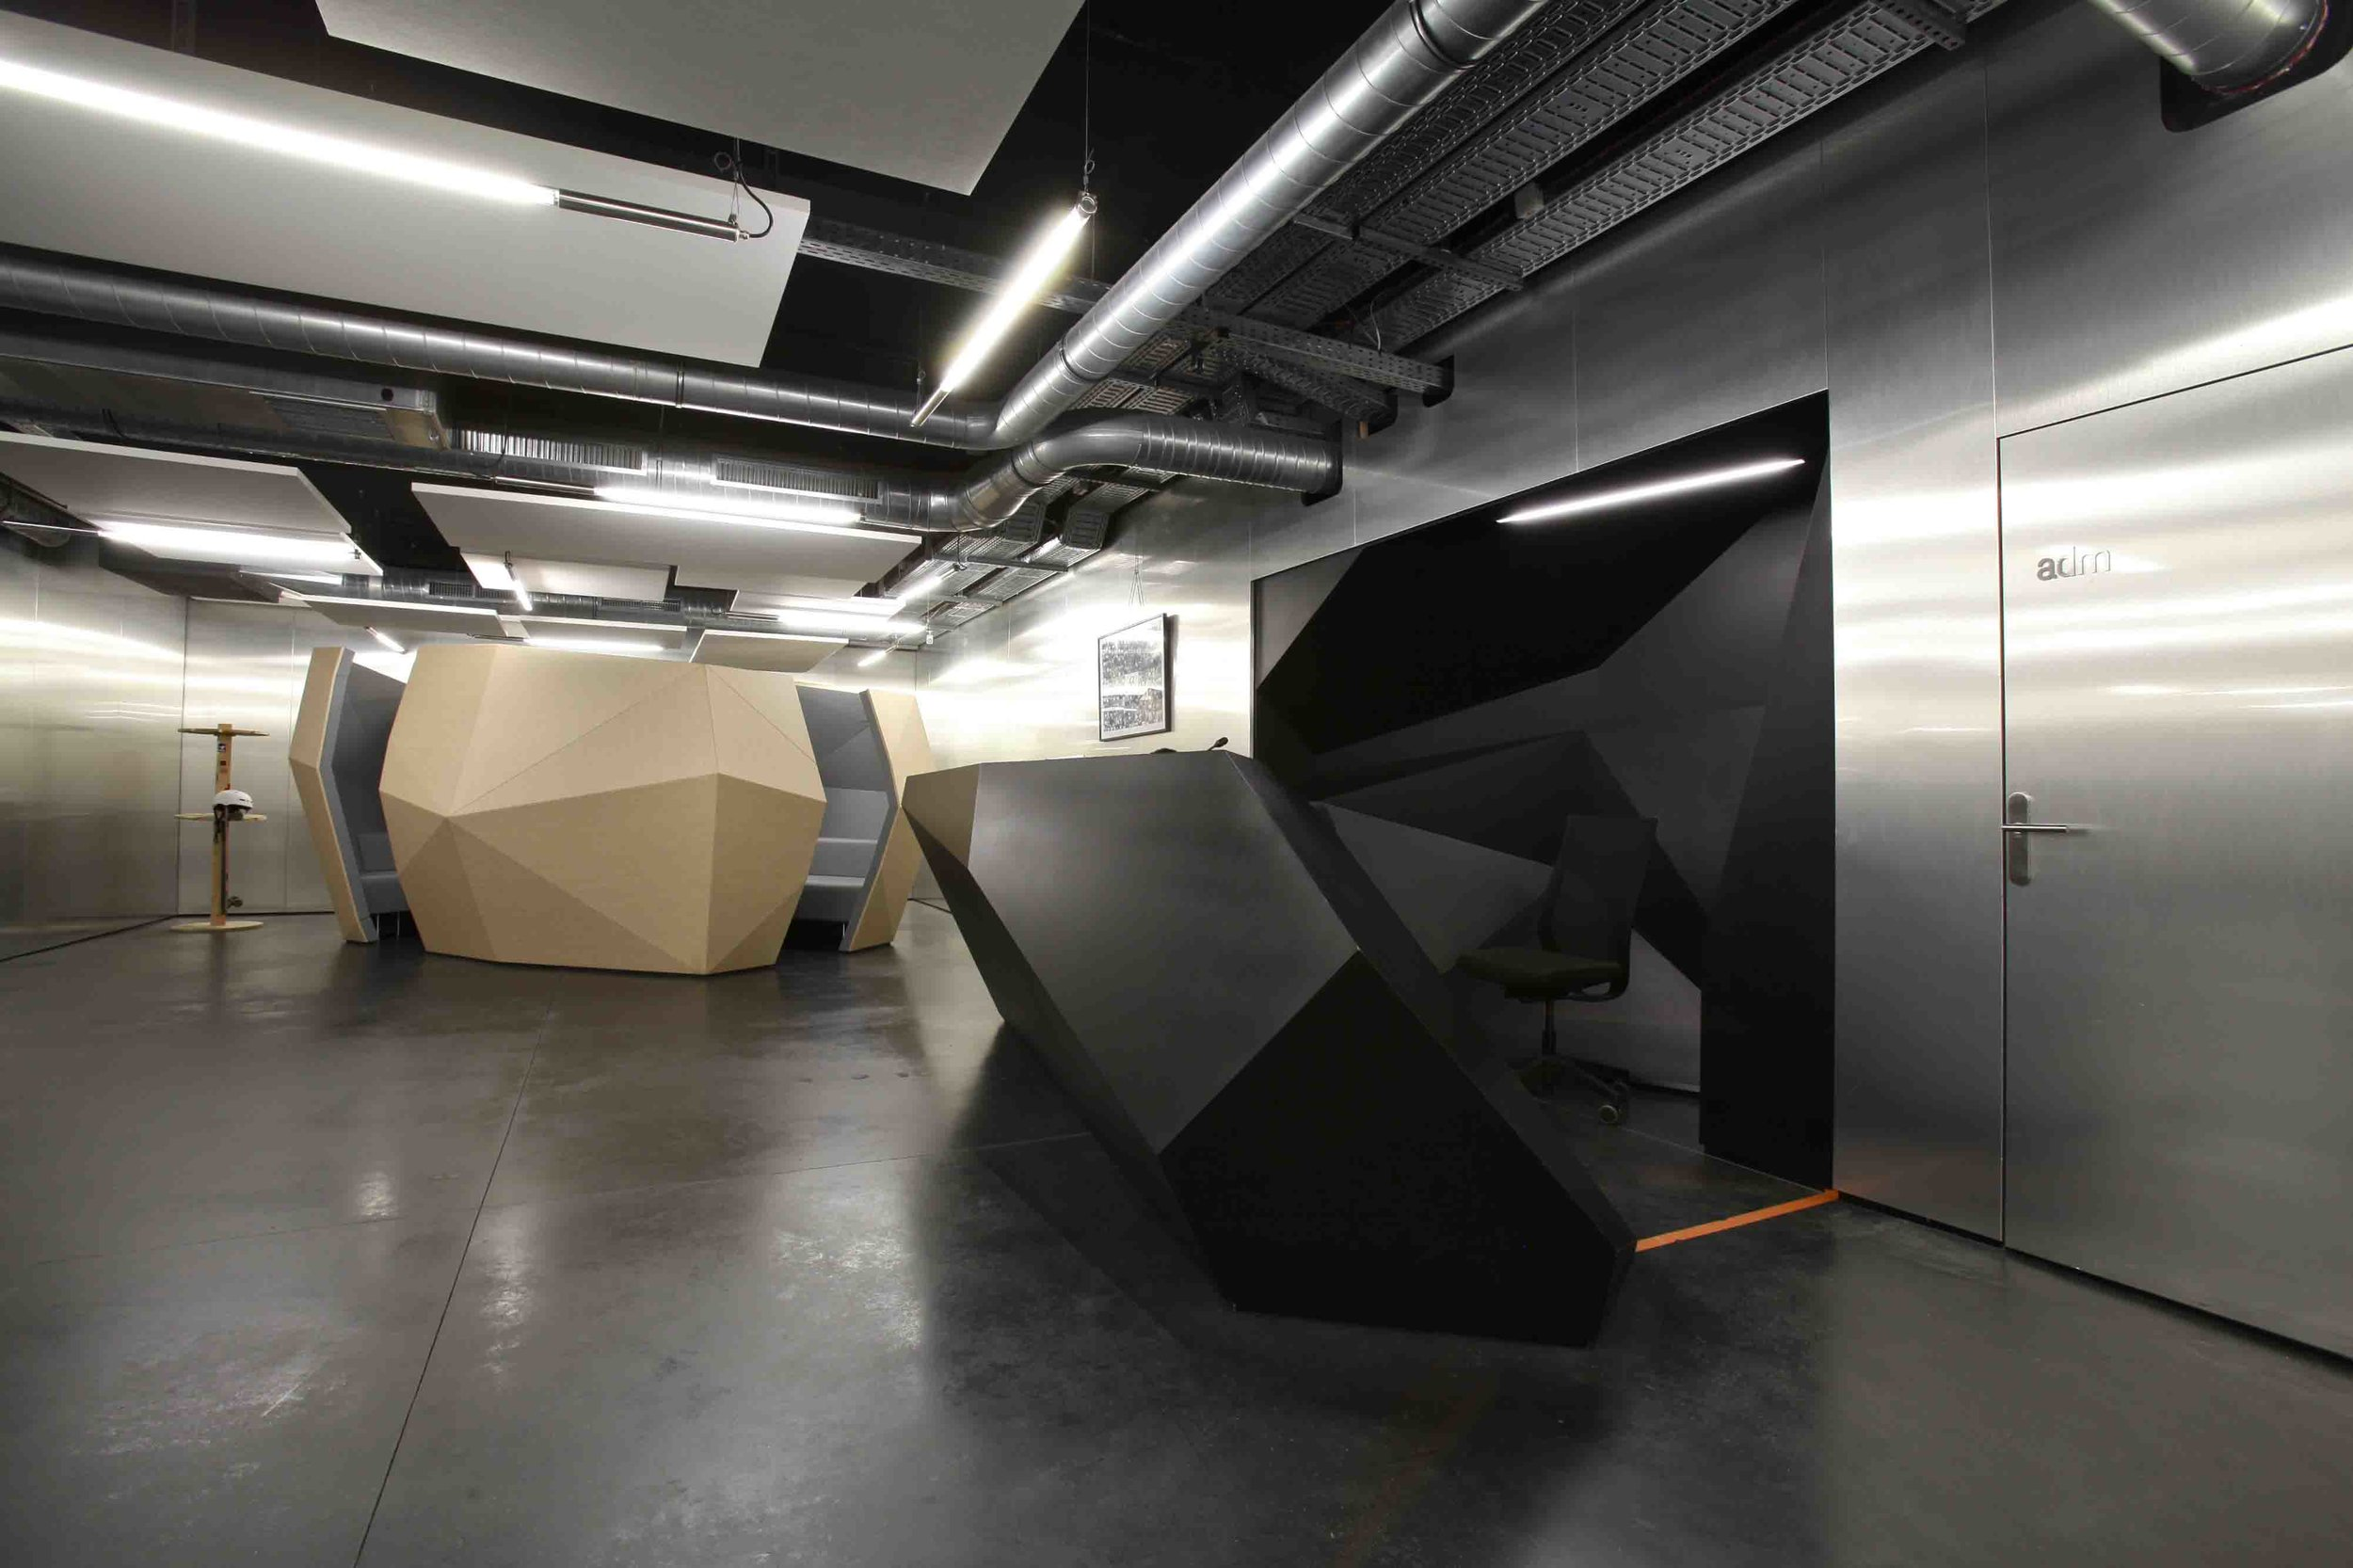 Ecole 42 - NOC 42 - AR Studio Architectures - Xavier NIEL - Kwame YAMGNANE - Florian BUCHER - Nicolas SADIRAC - Free - Reinventer Paris (4).JPG